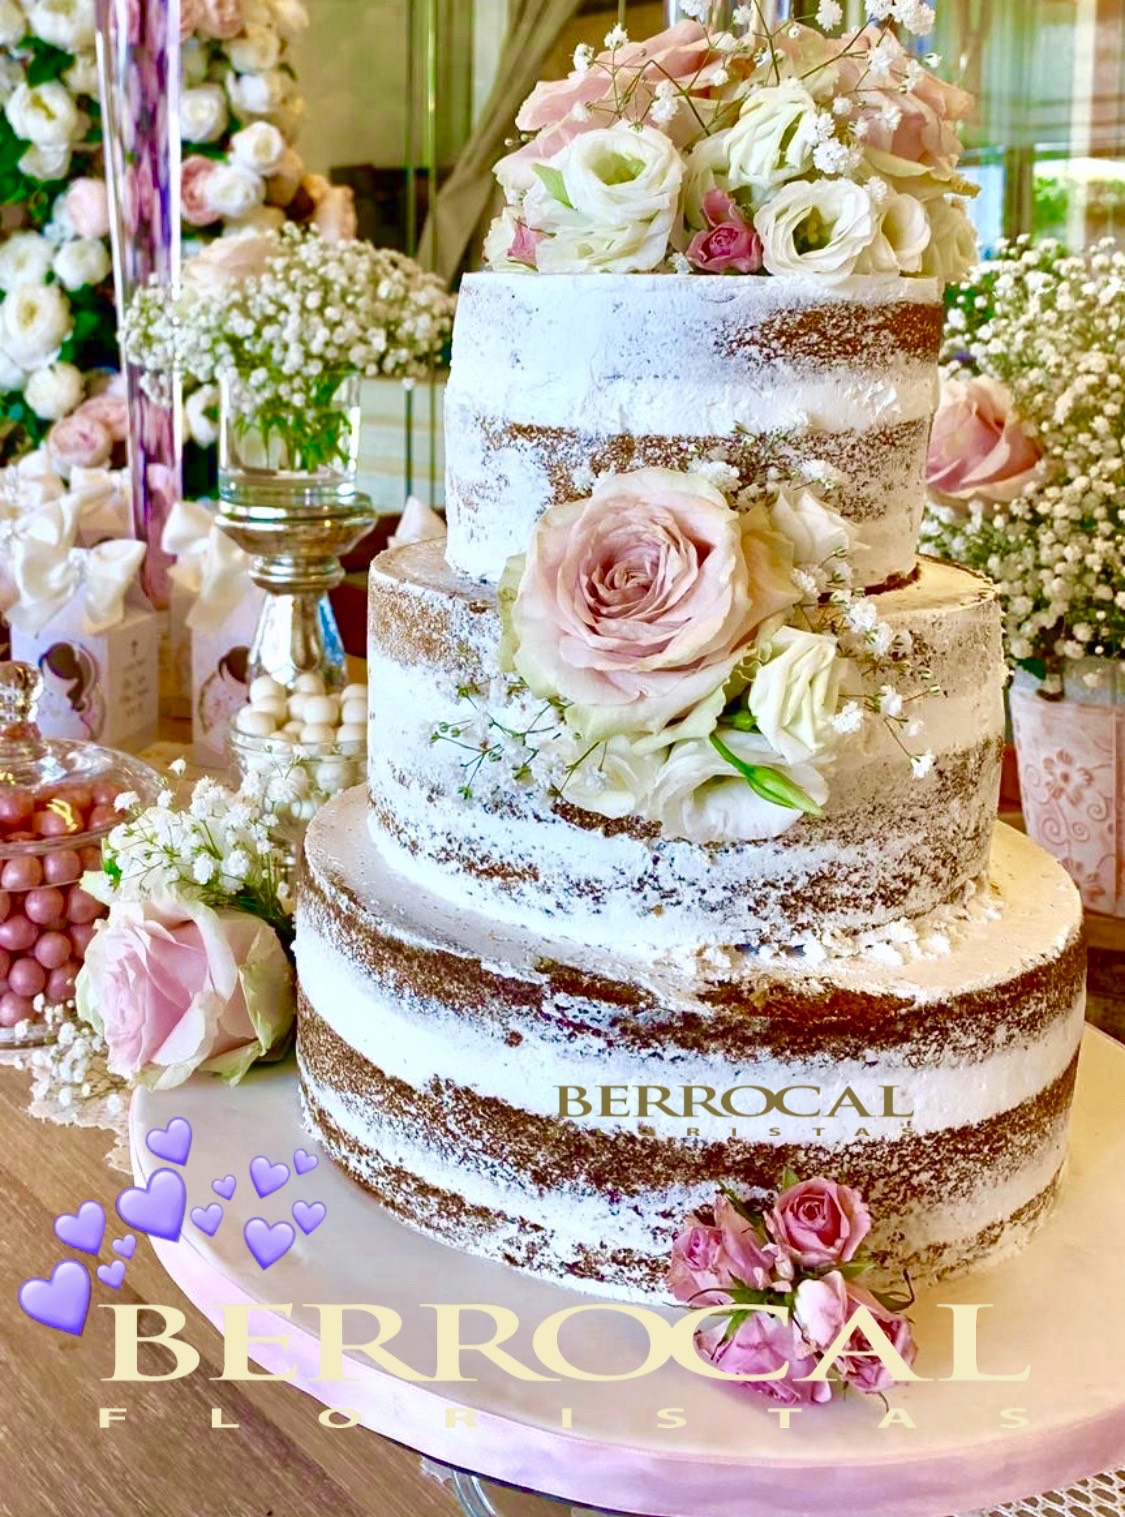 Tarta decorada con flores rosadas. Rosas. Lisianthus y Paniculata.